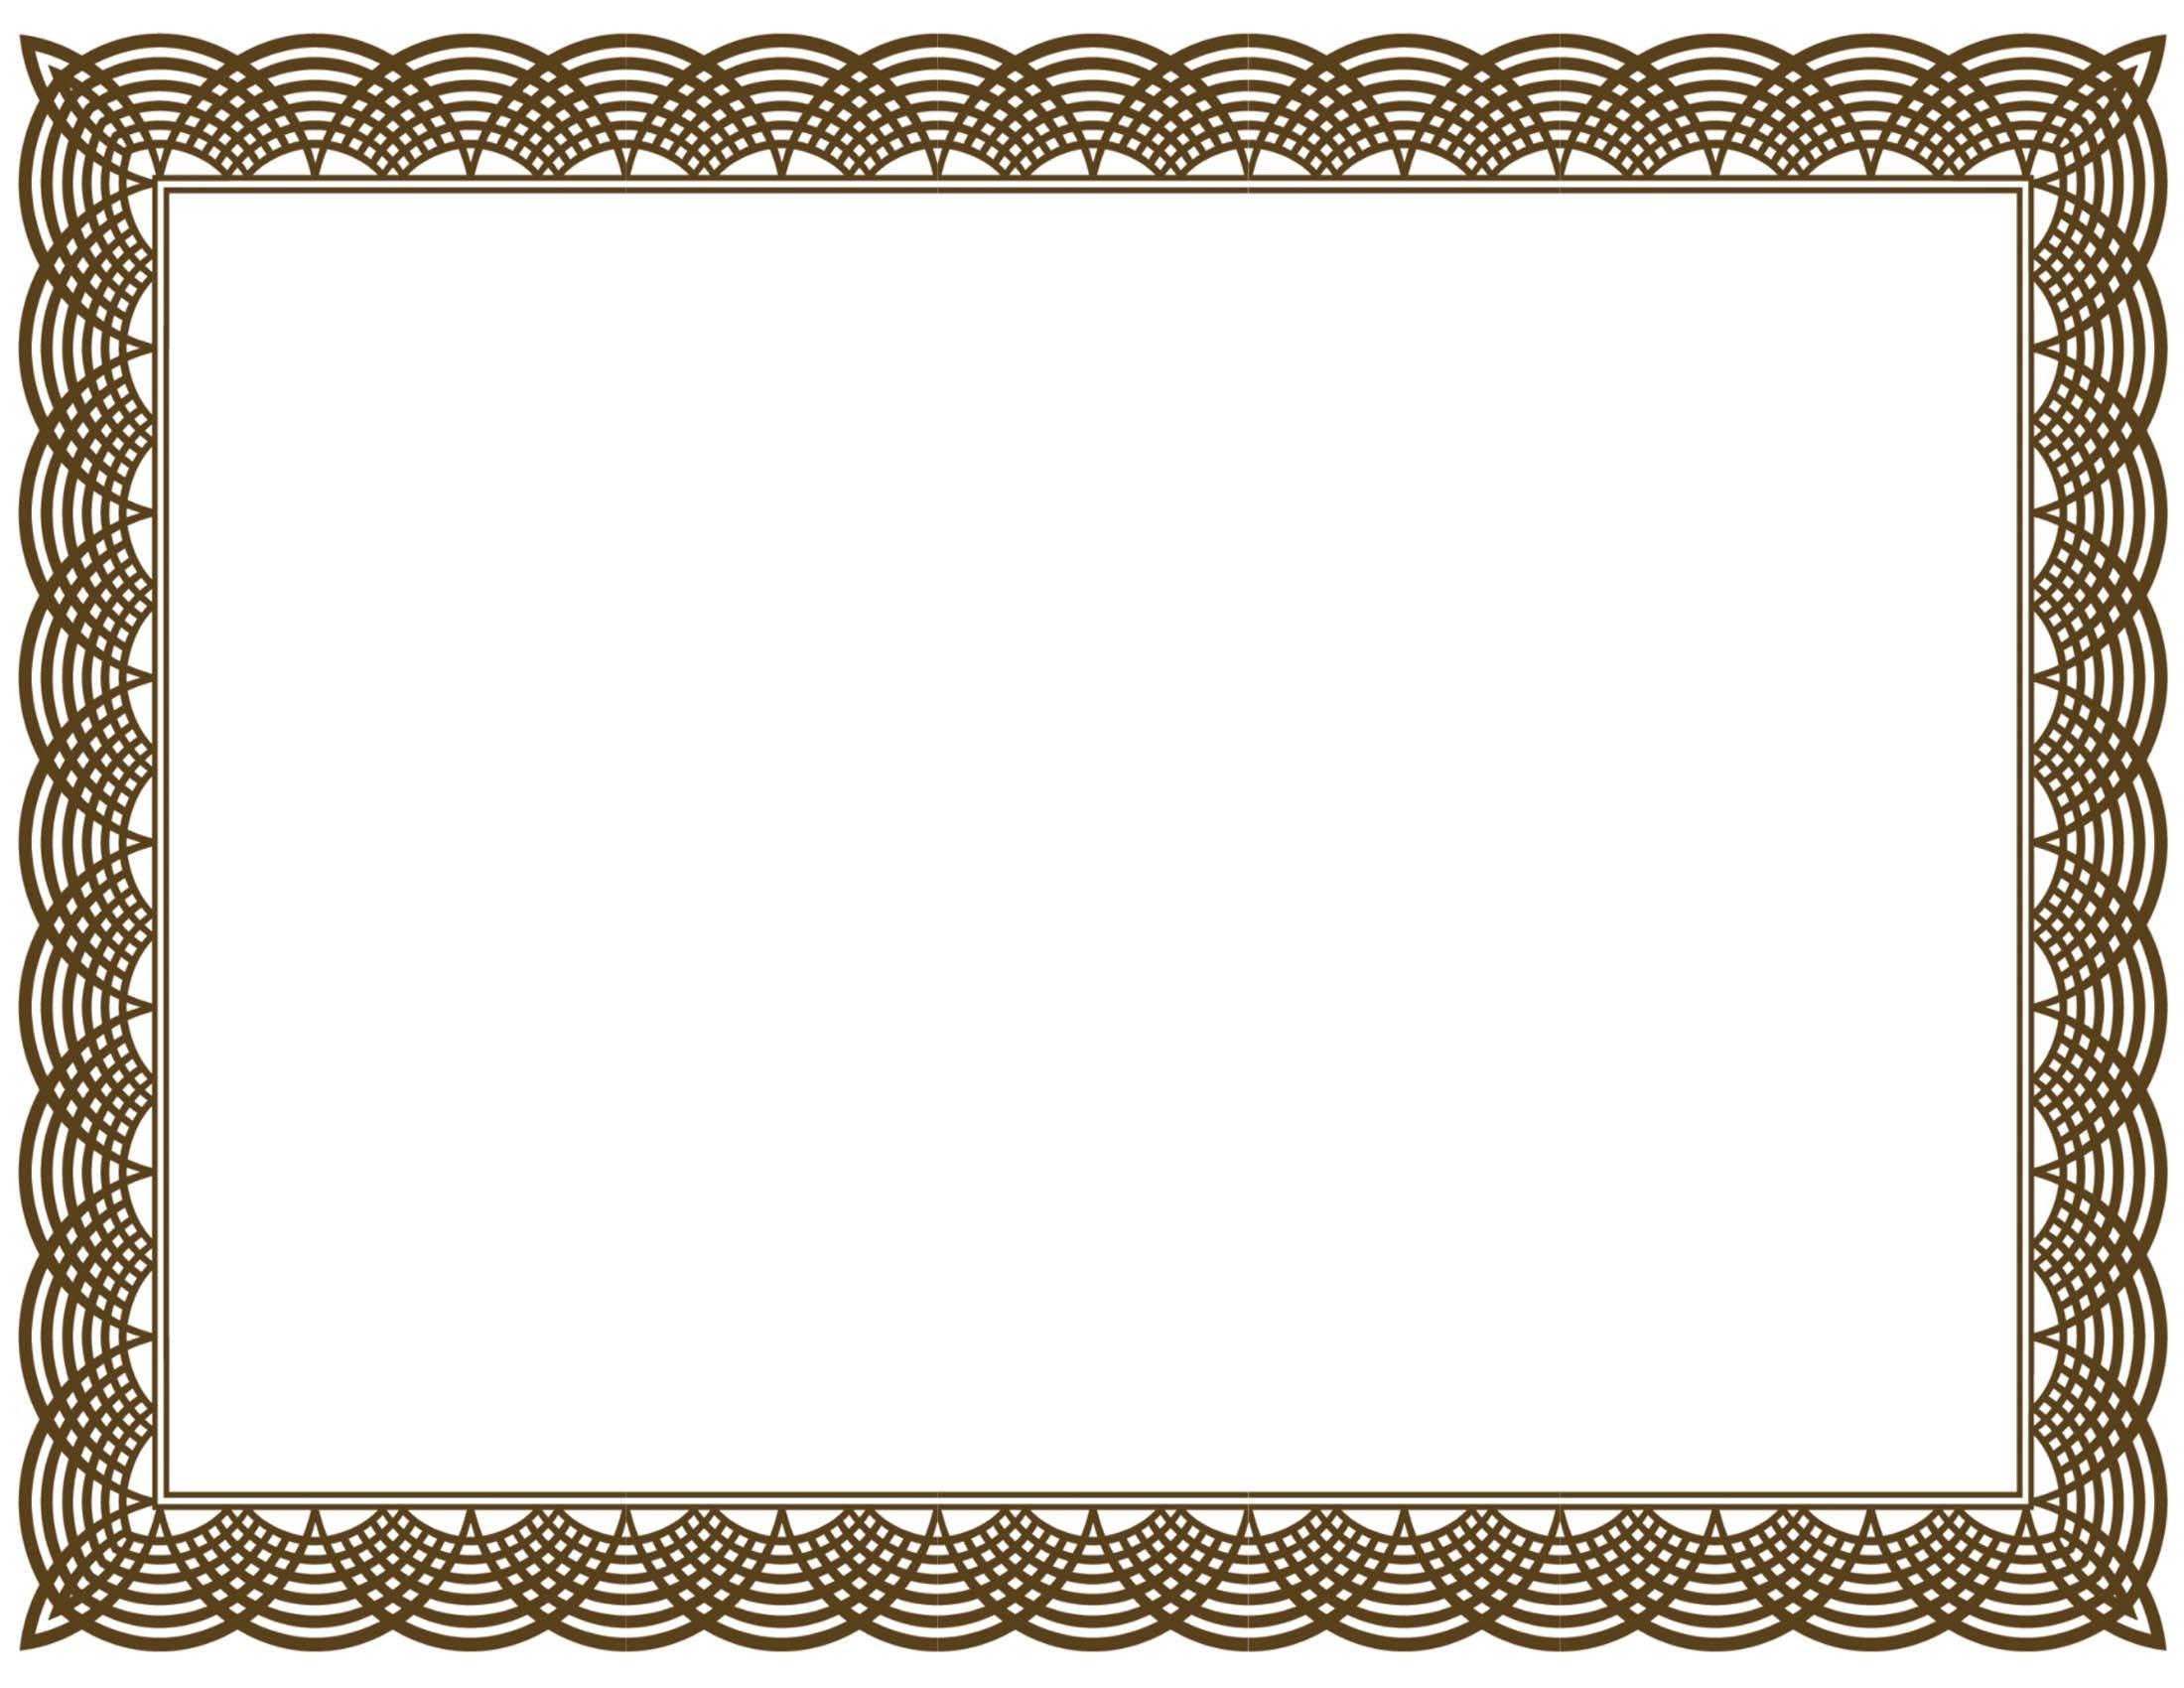 Free Printable Certificate Border Templates 1